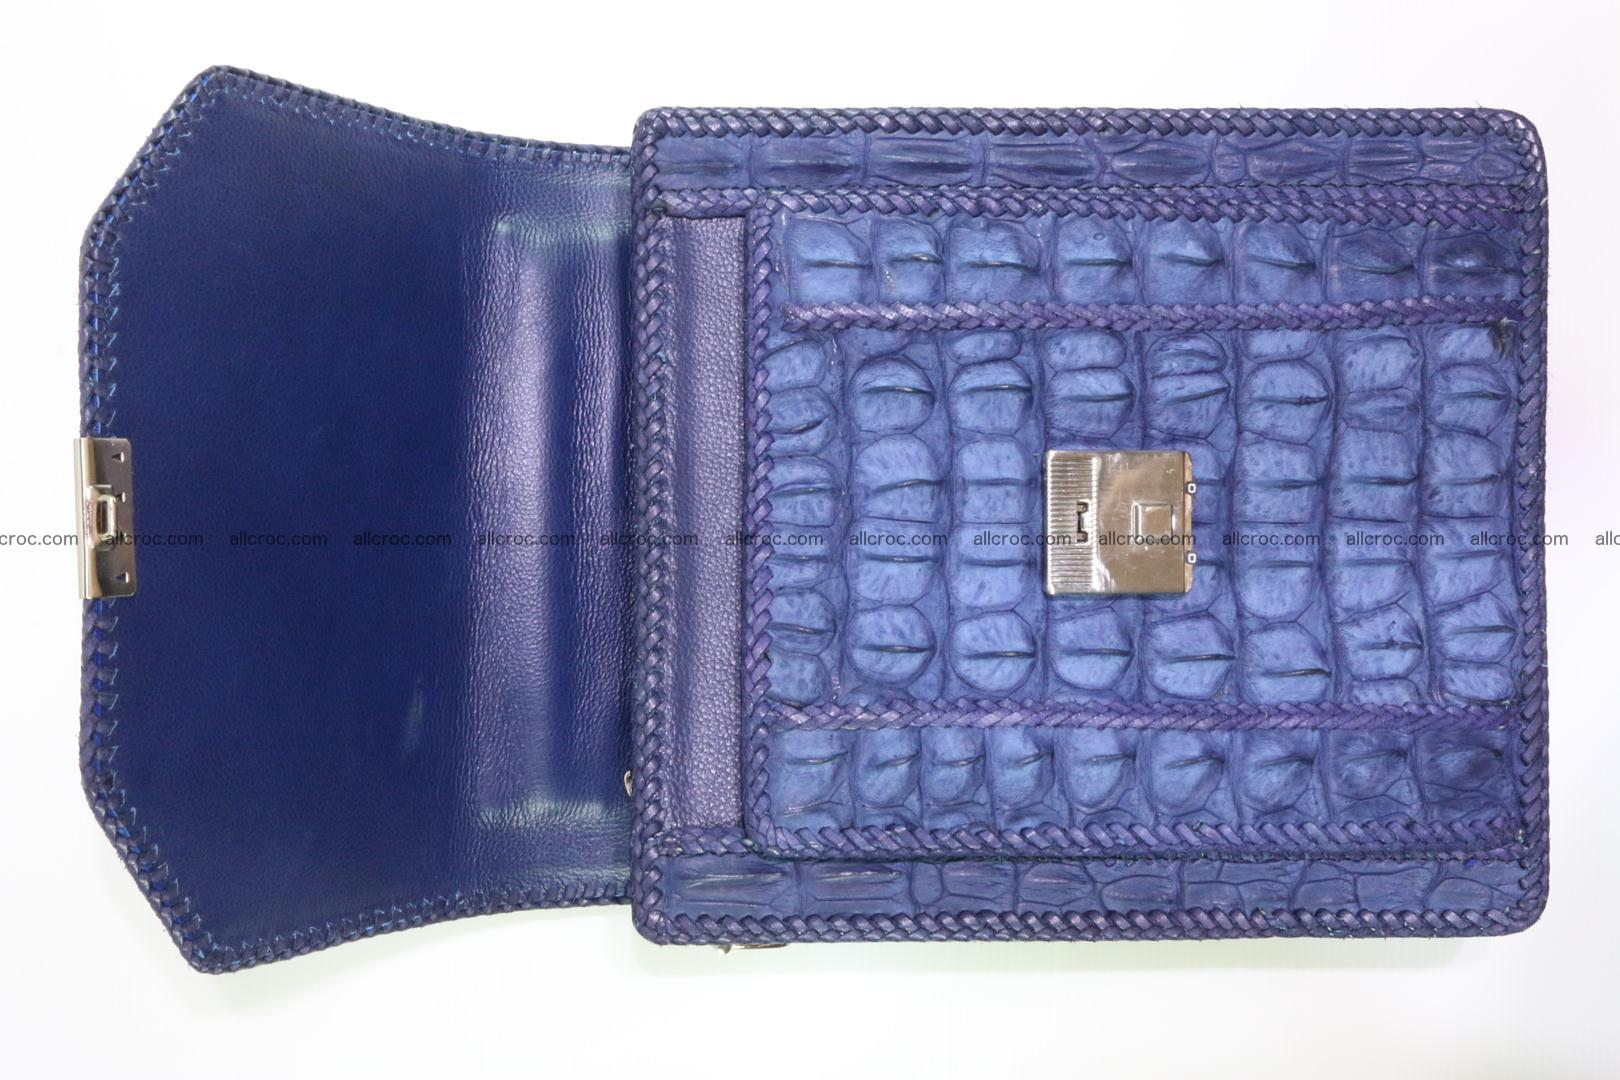 Crocodile skin messenger bag braided edges 422 Foto 15